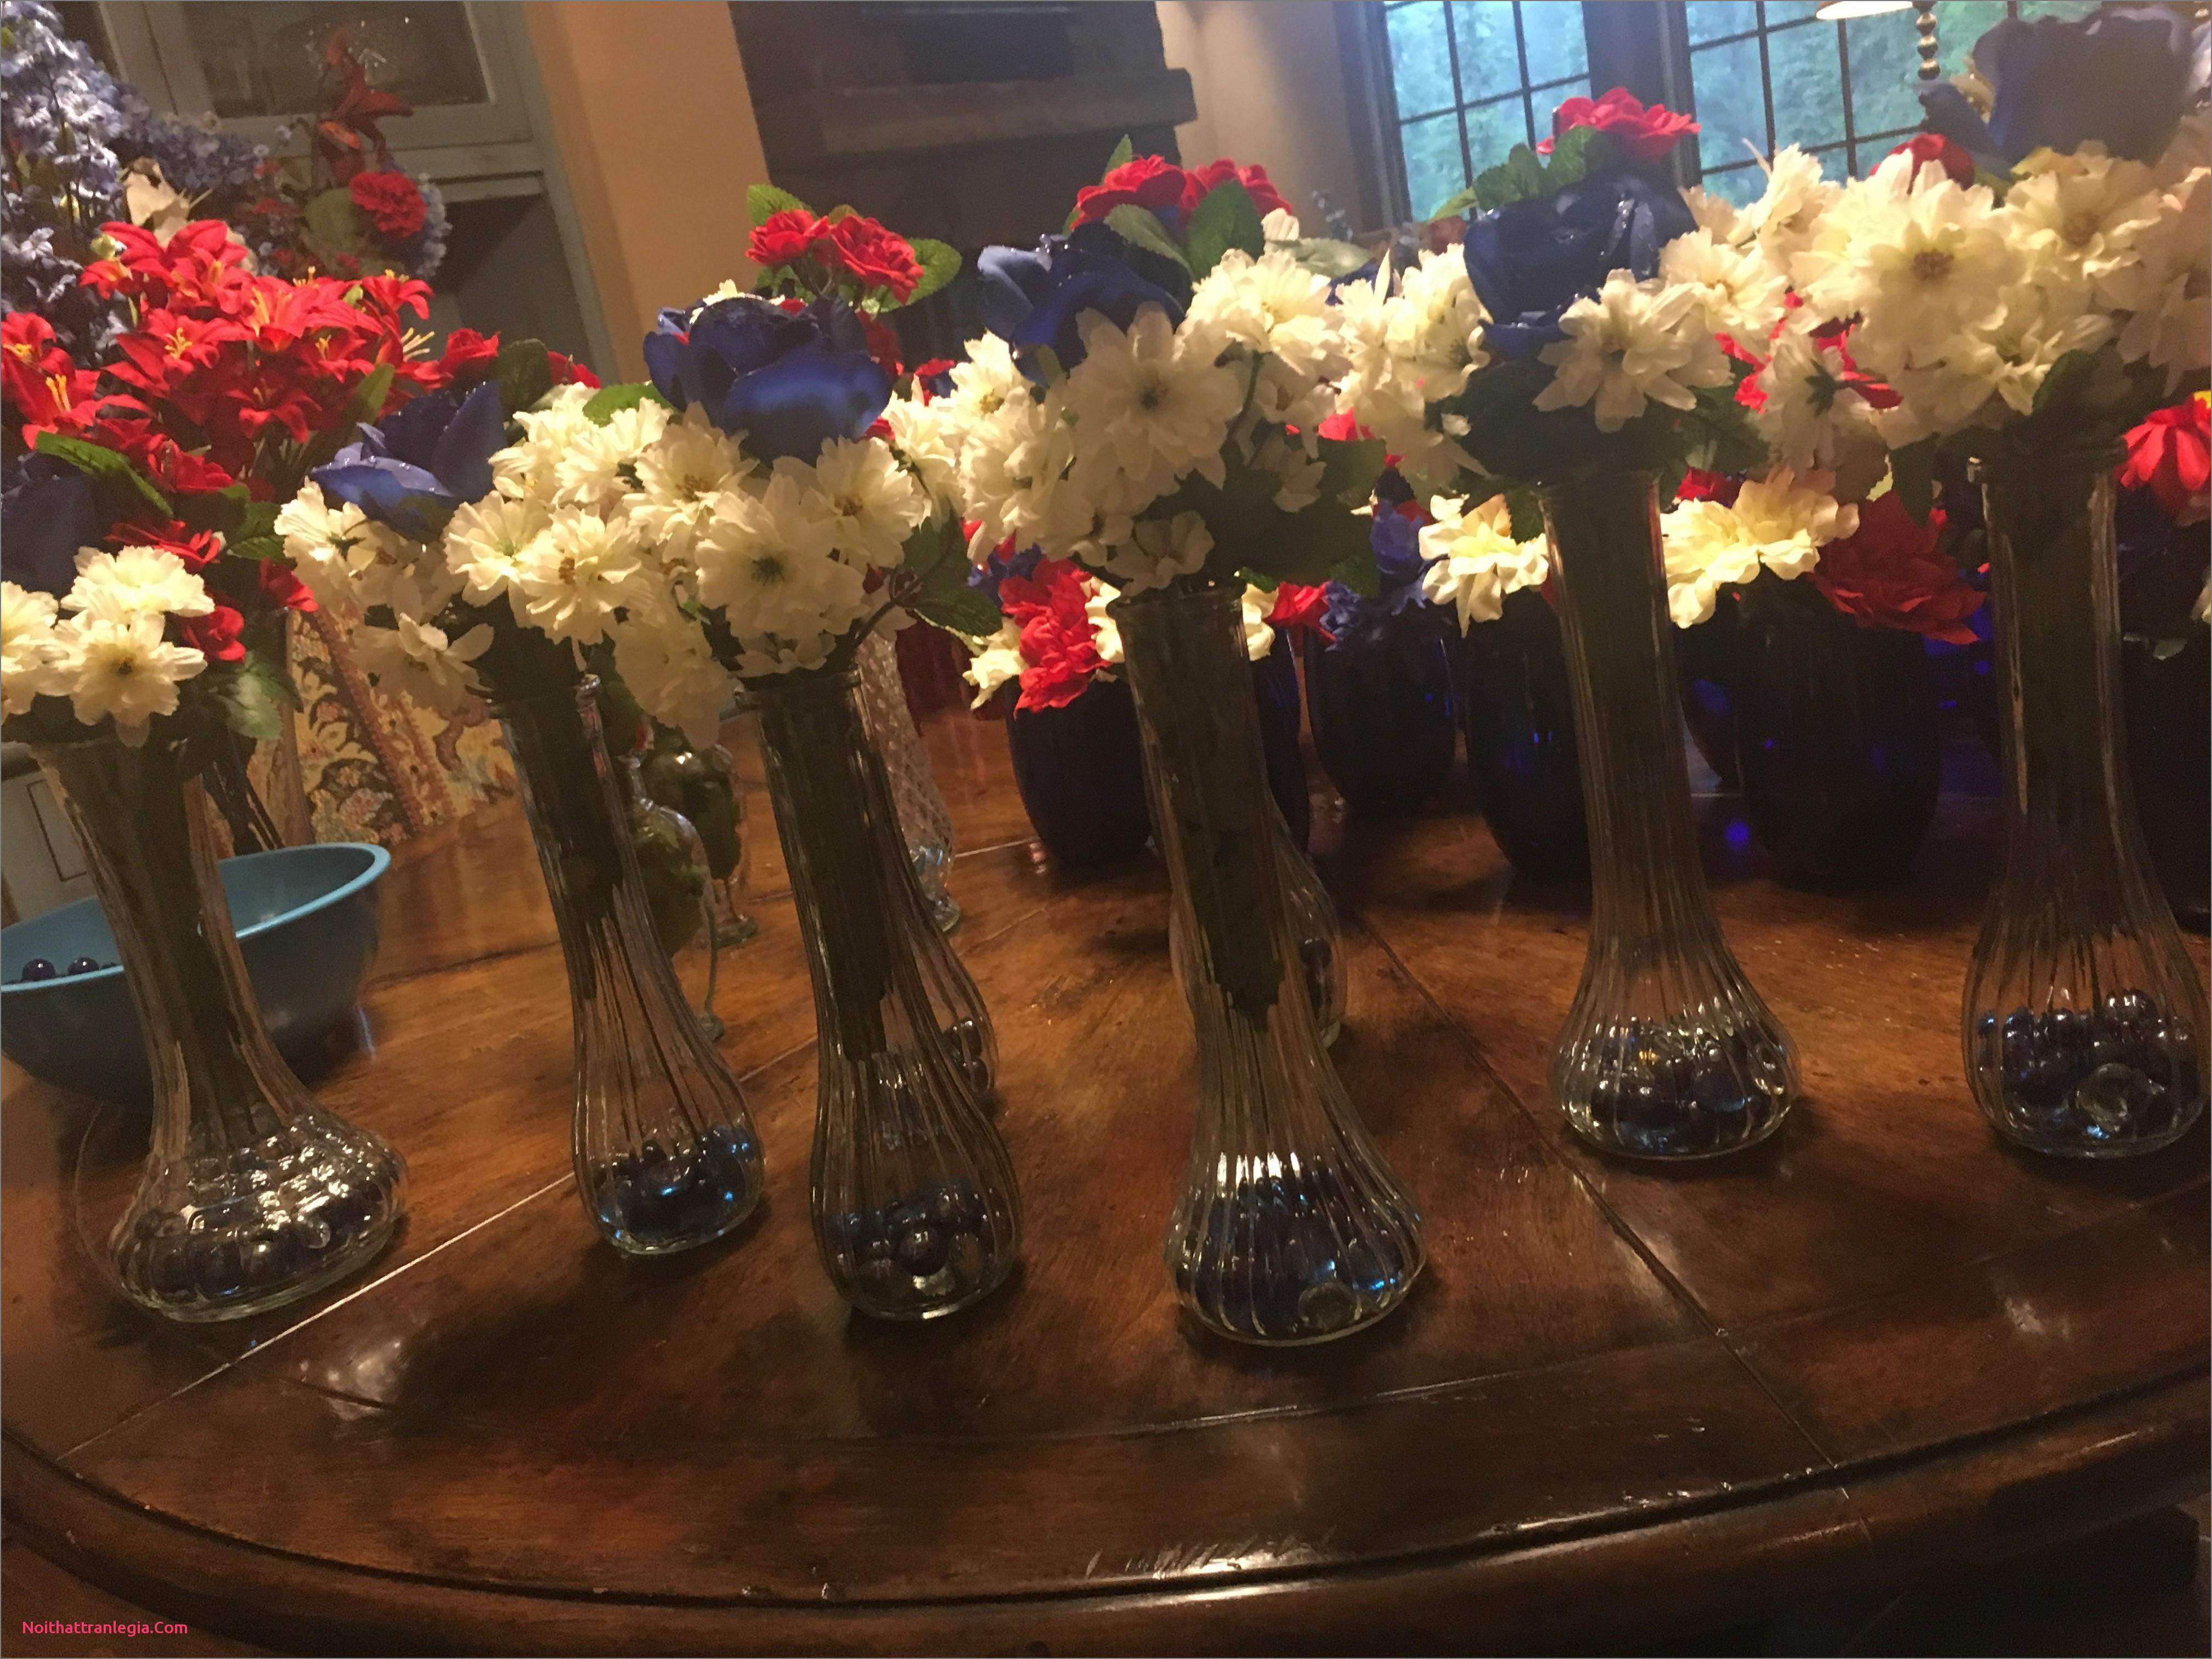 green glass vases for sale of 20 how to clean flower vases noithattranlegia vases design throughout diy wedding decoration ideas inspirational dollar tree wedding decorations awesome h vases dollar vase i 0d